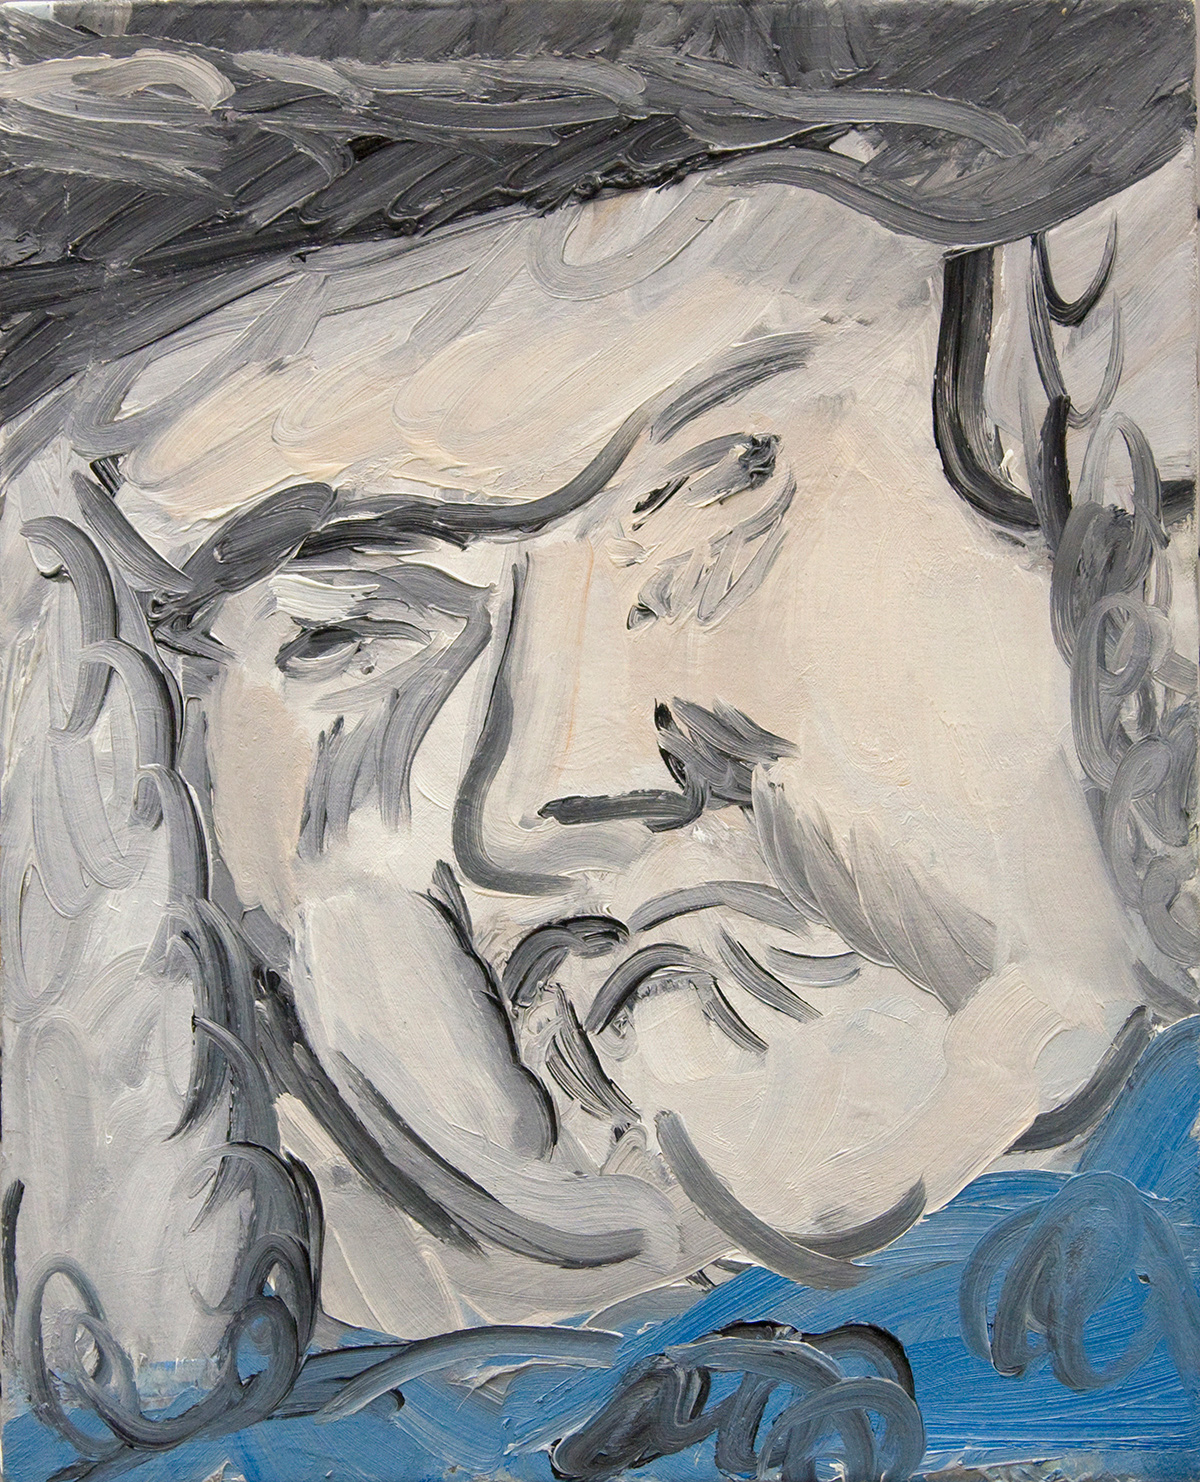 'Mr Krutz' 2016   Oil on canvas. 50 x 40 cm